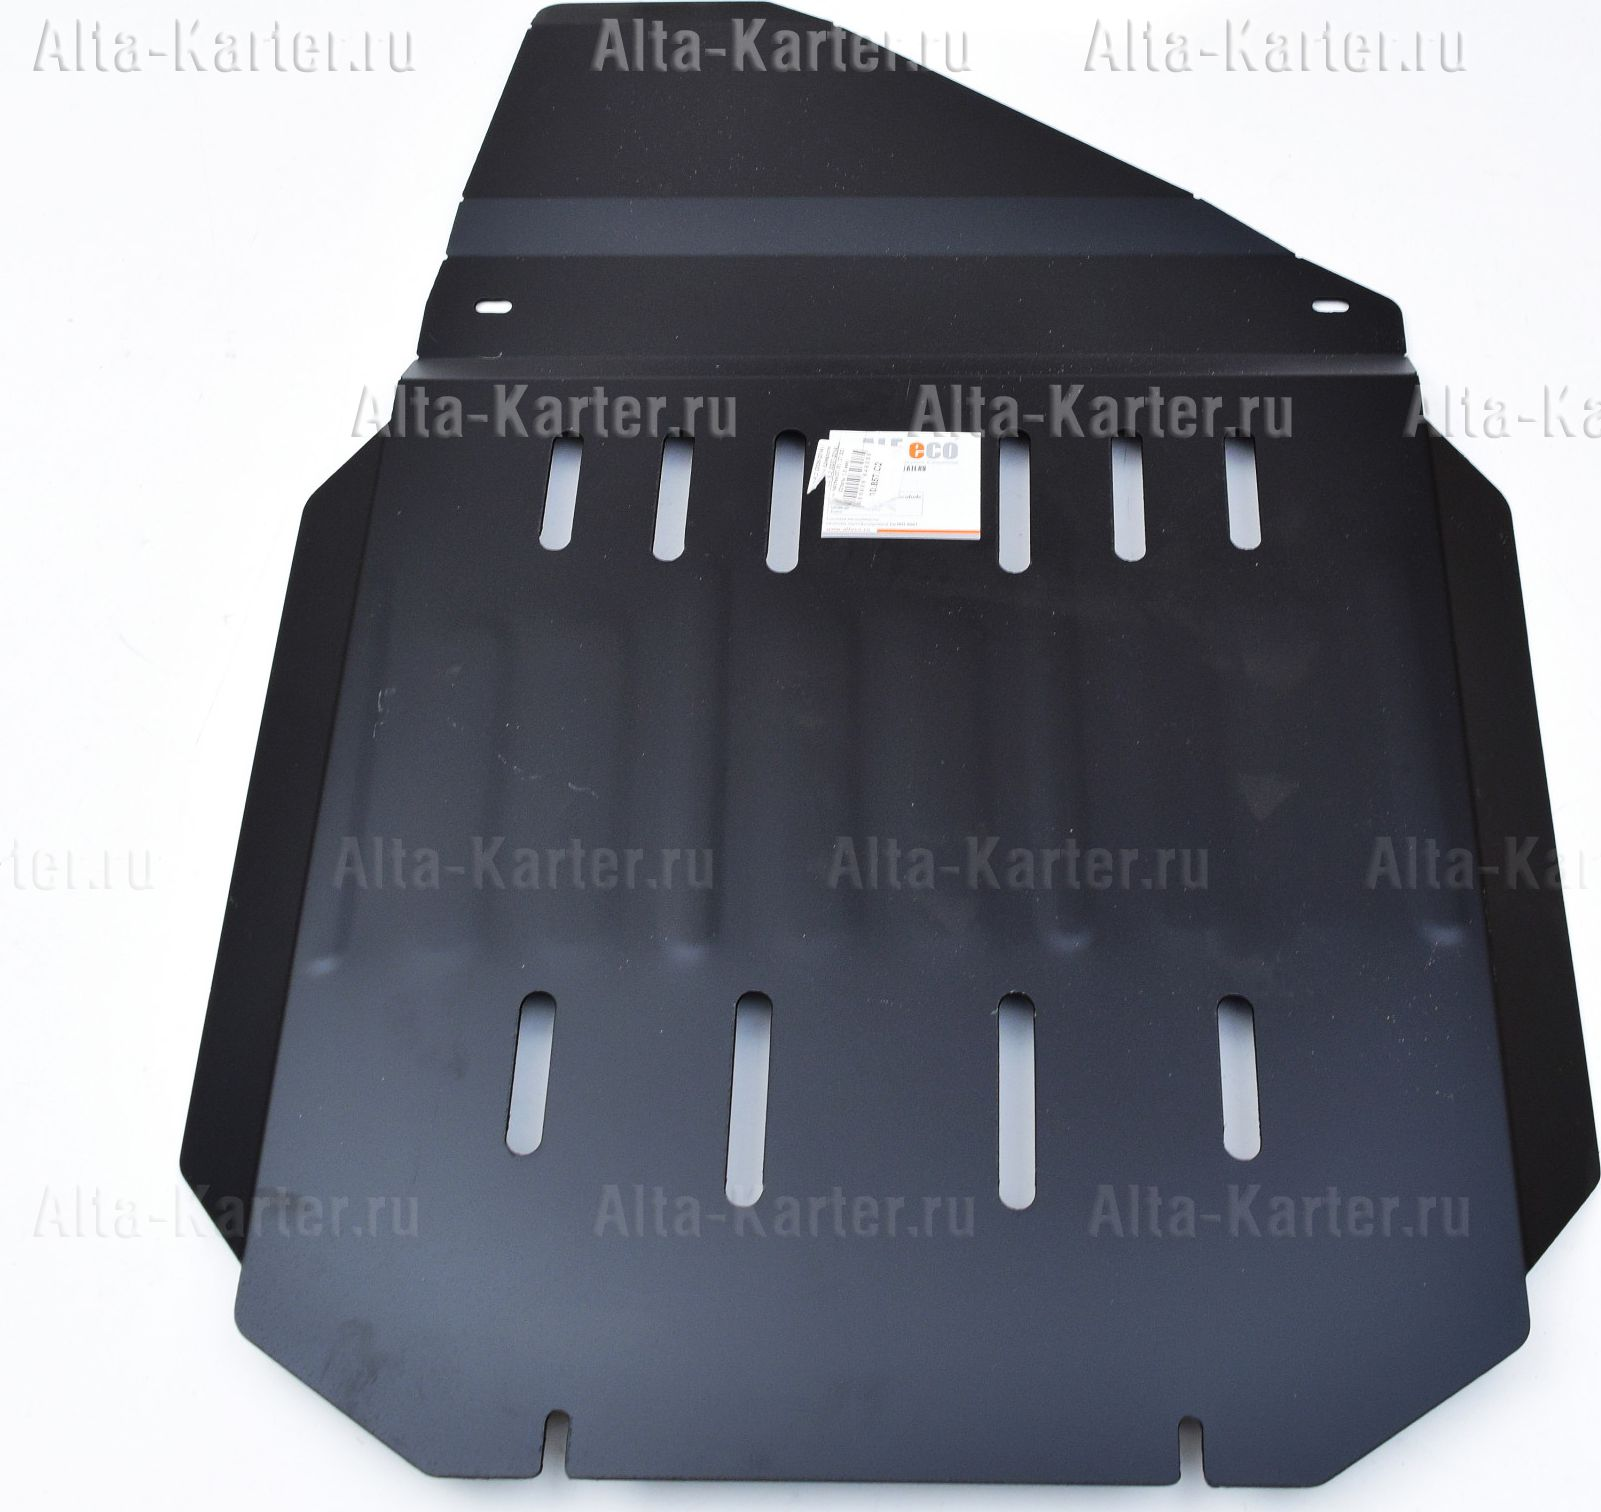 Защита Alfeco для КПП Chevrolet Tahoe 2006-2014. Артикул ALF.37.02